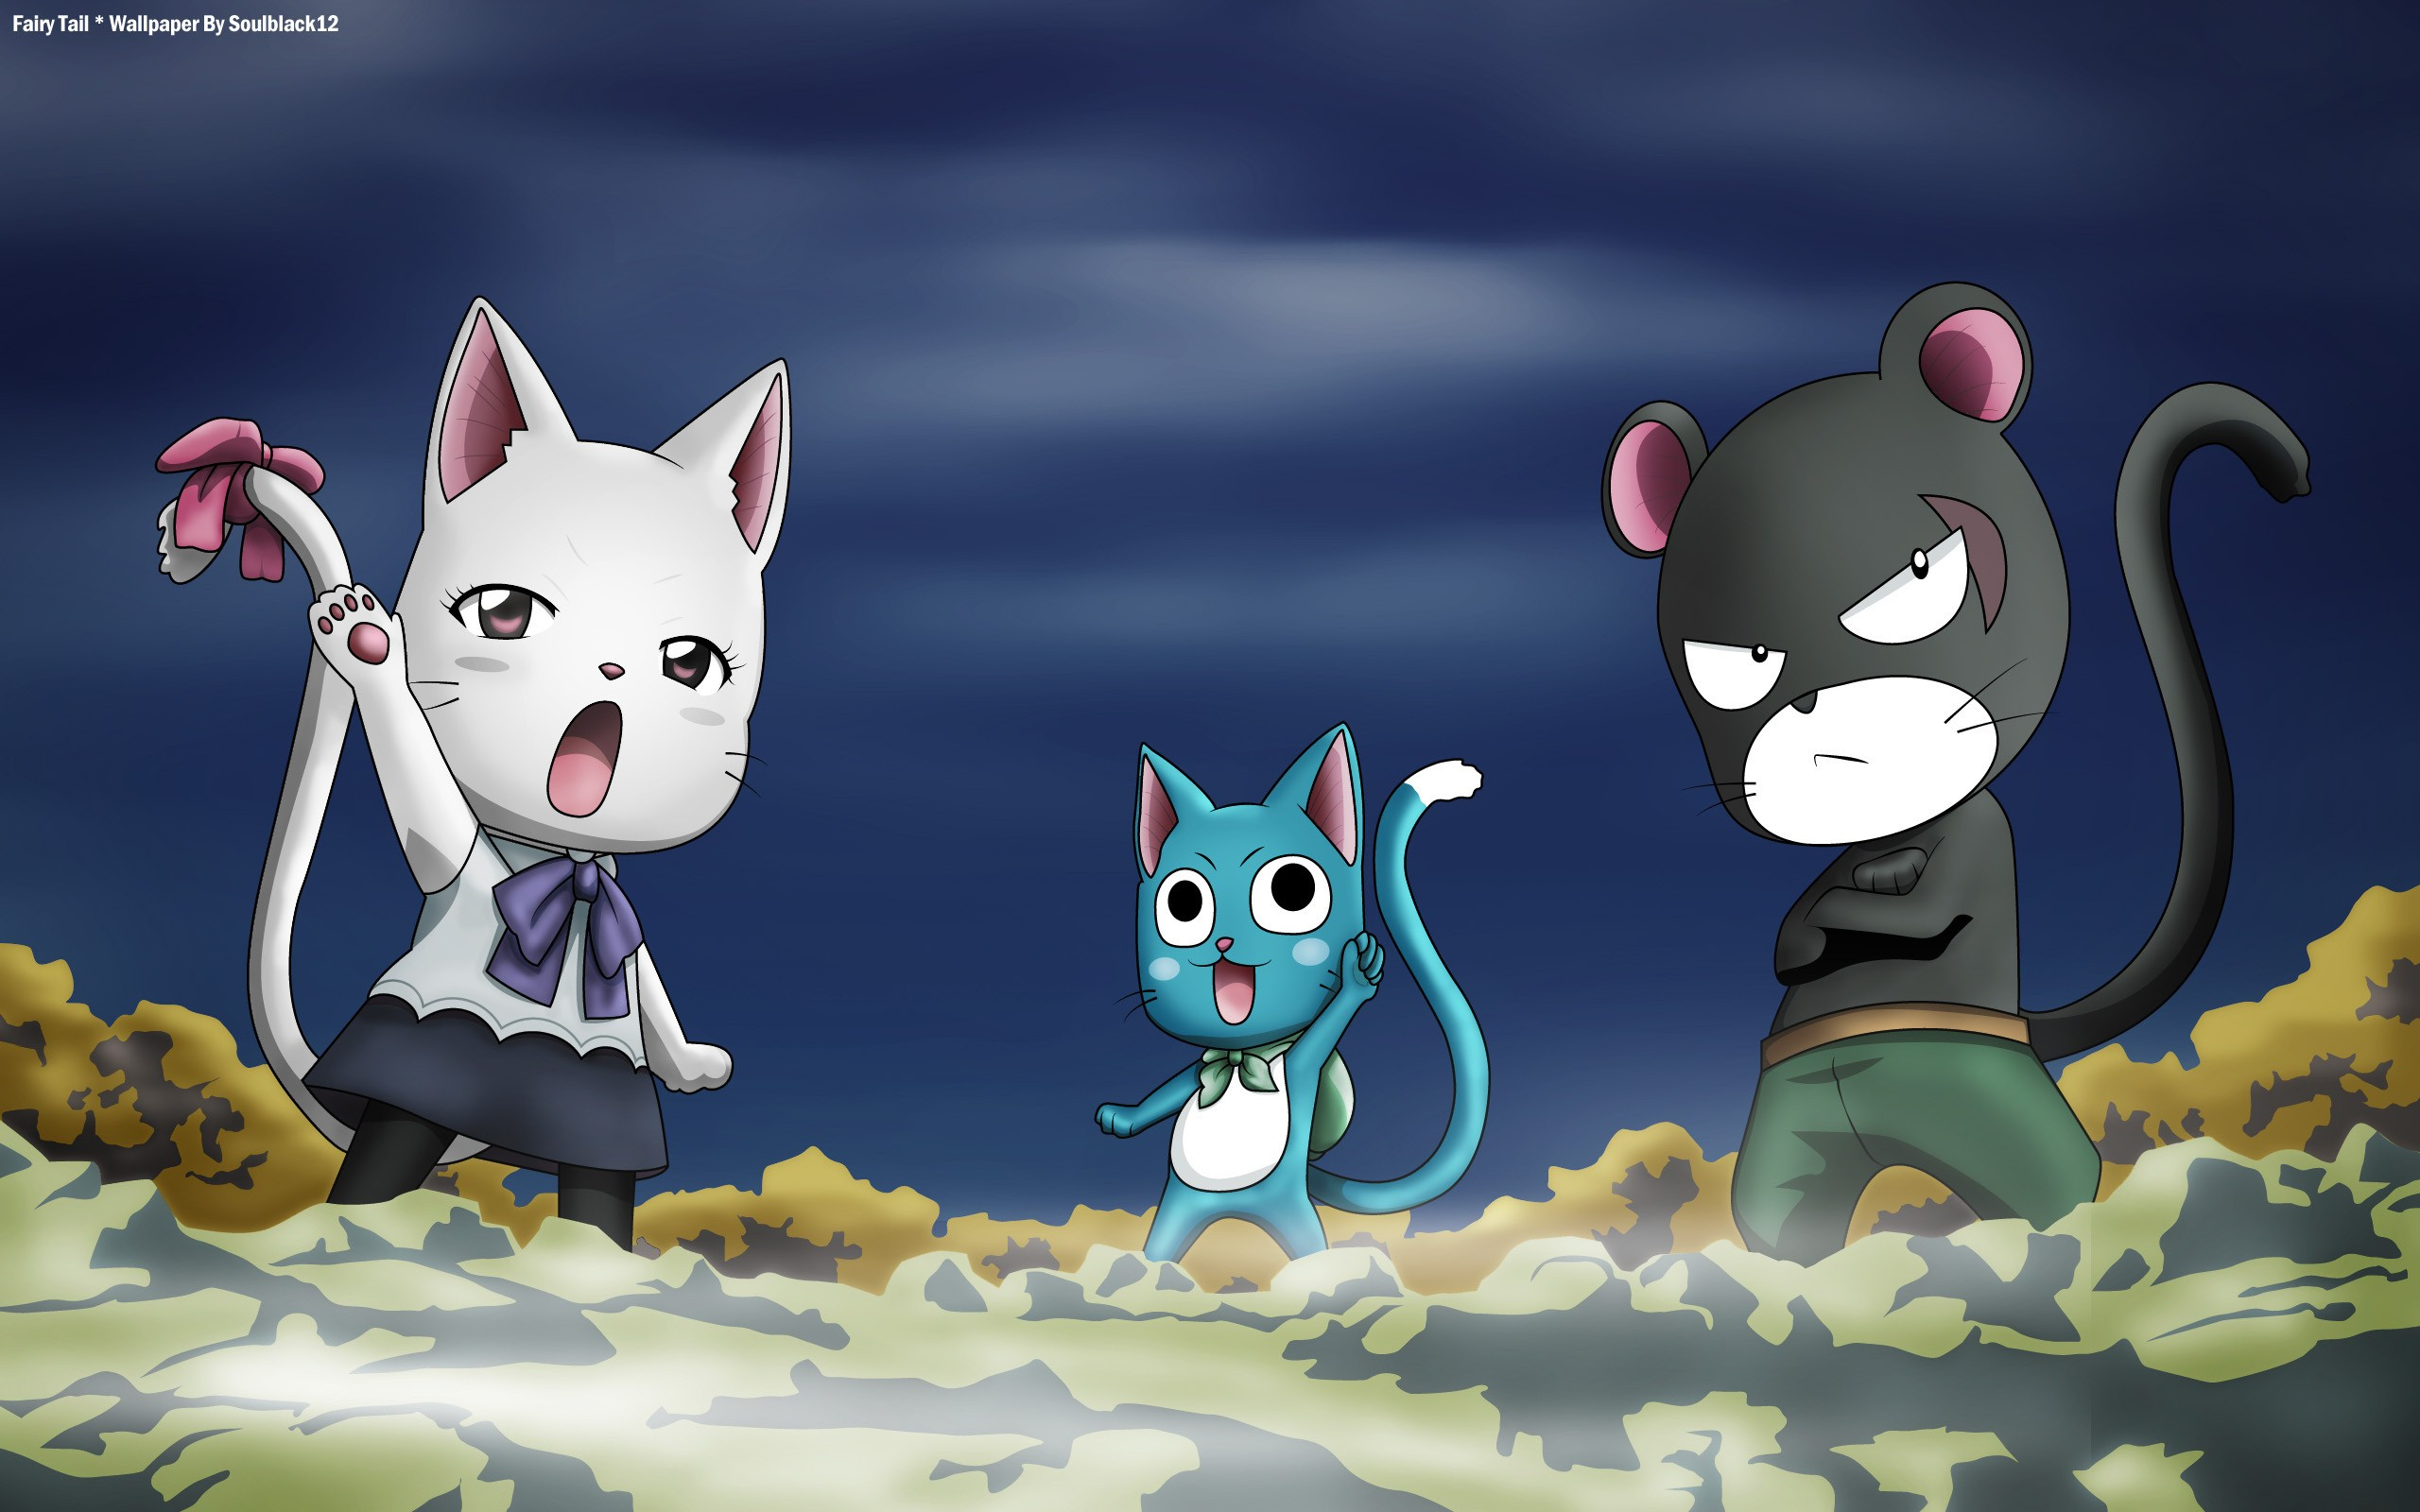 Wallpaper   Cats From Fairy Tale   2560x1600 Wallpaper   teahubio 2560x1600